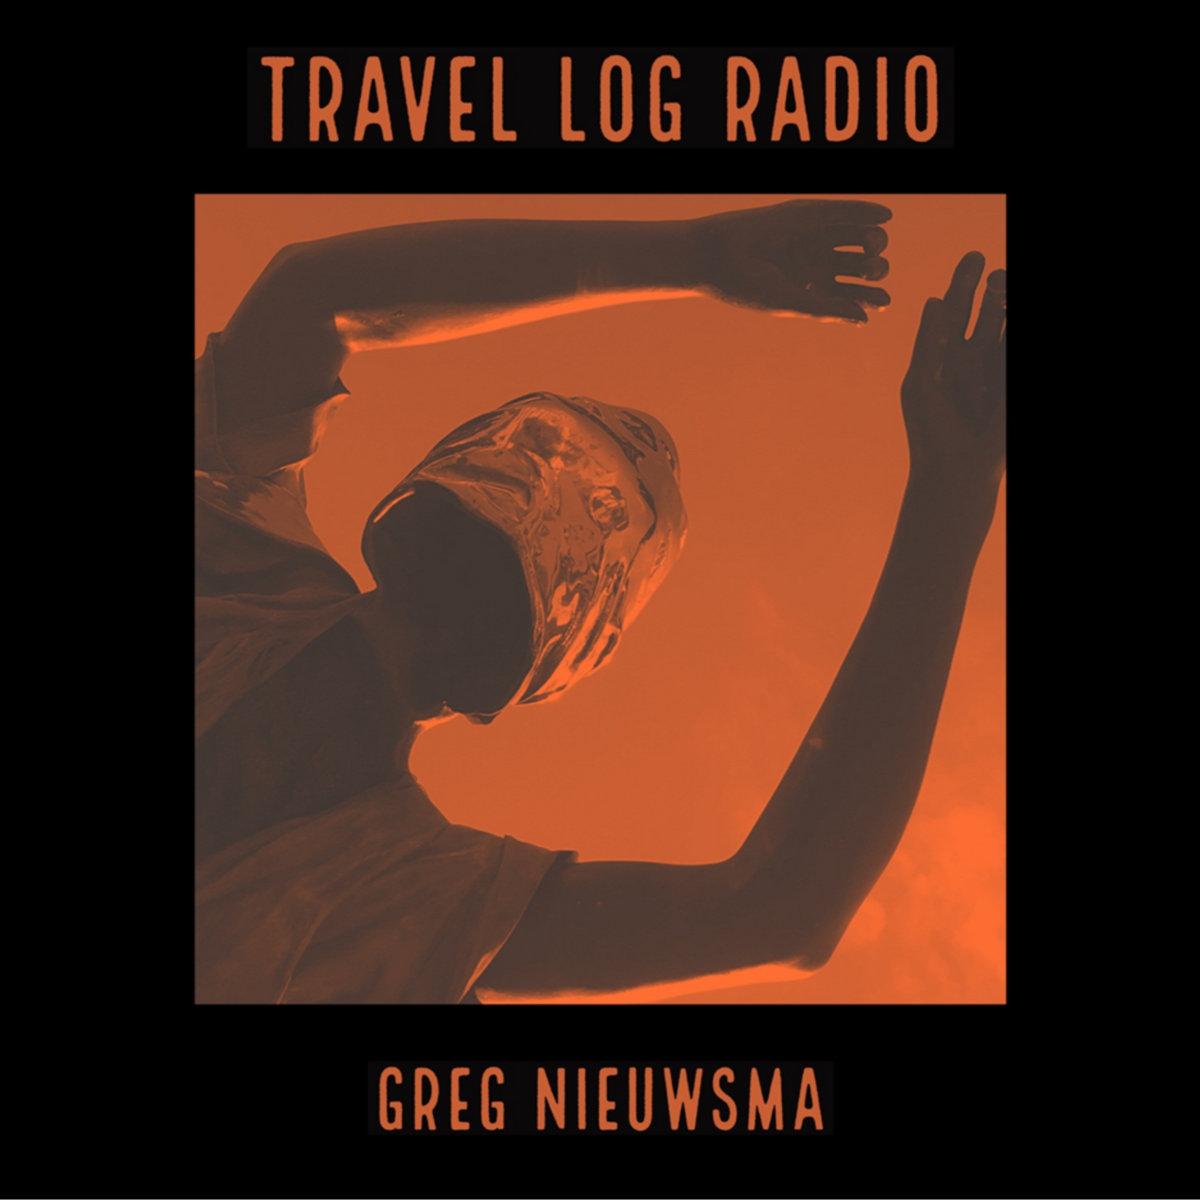 Greg Nieuwsma - Travel Log Radio